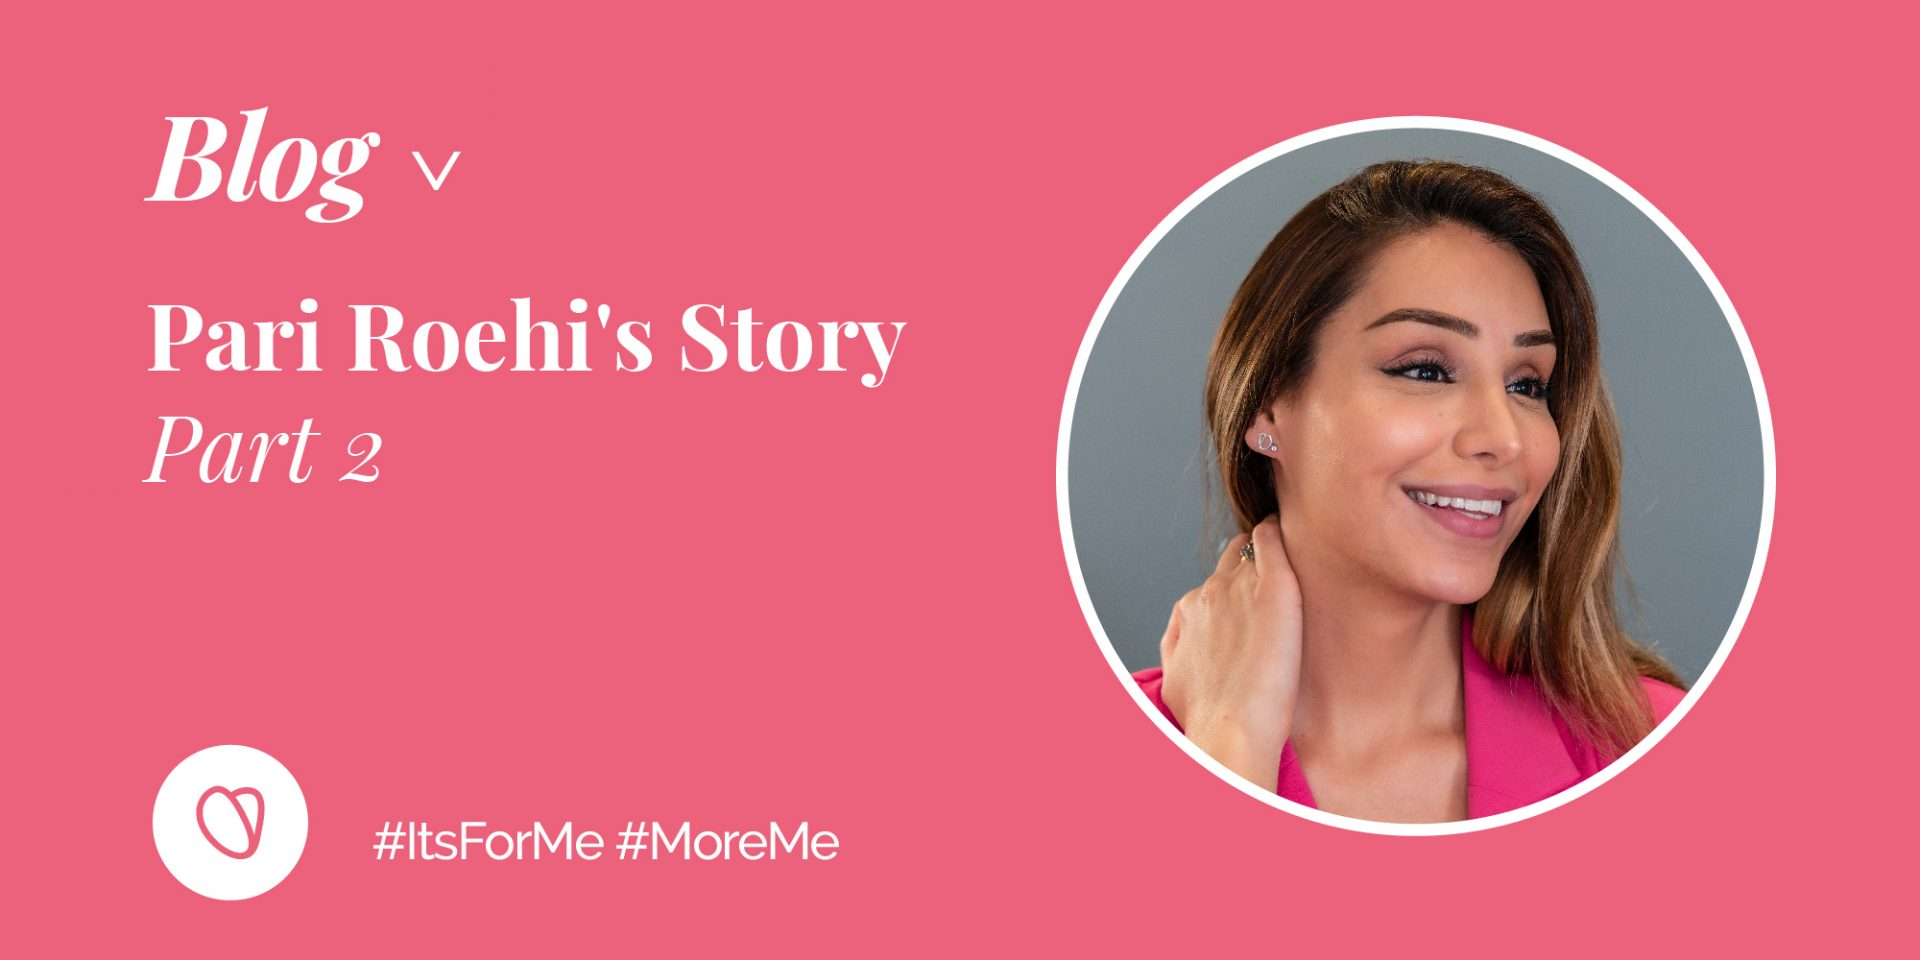 Pari Roehi's story – Part 2